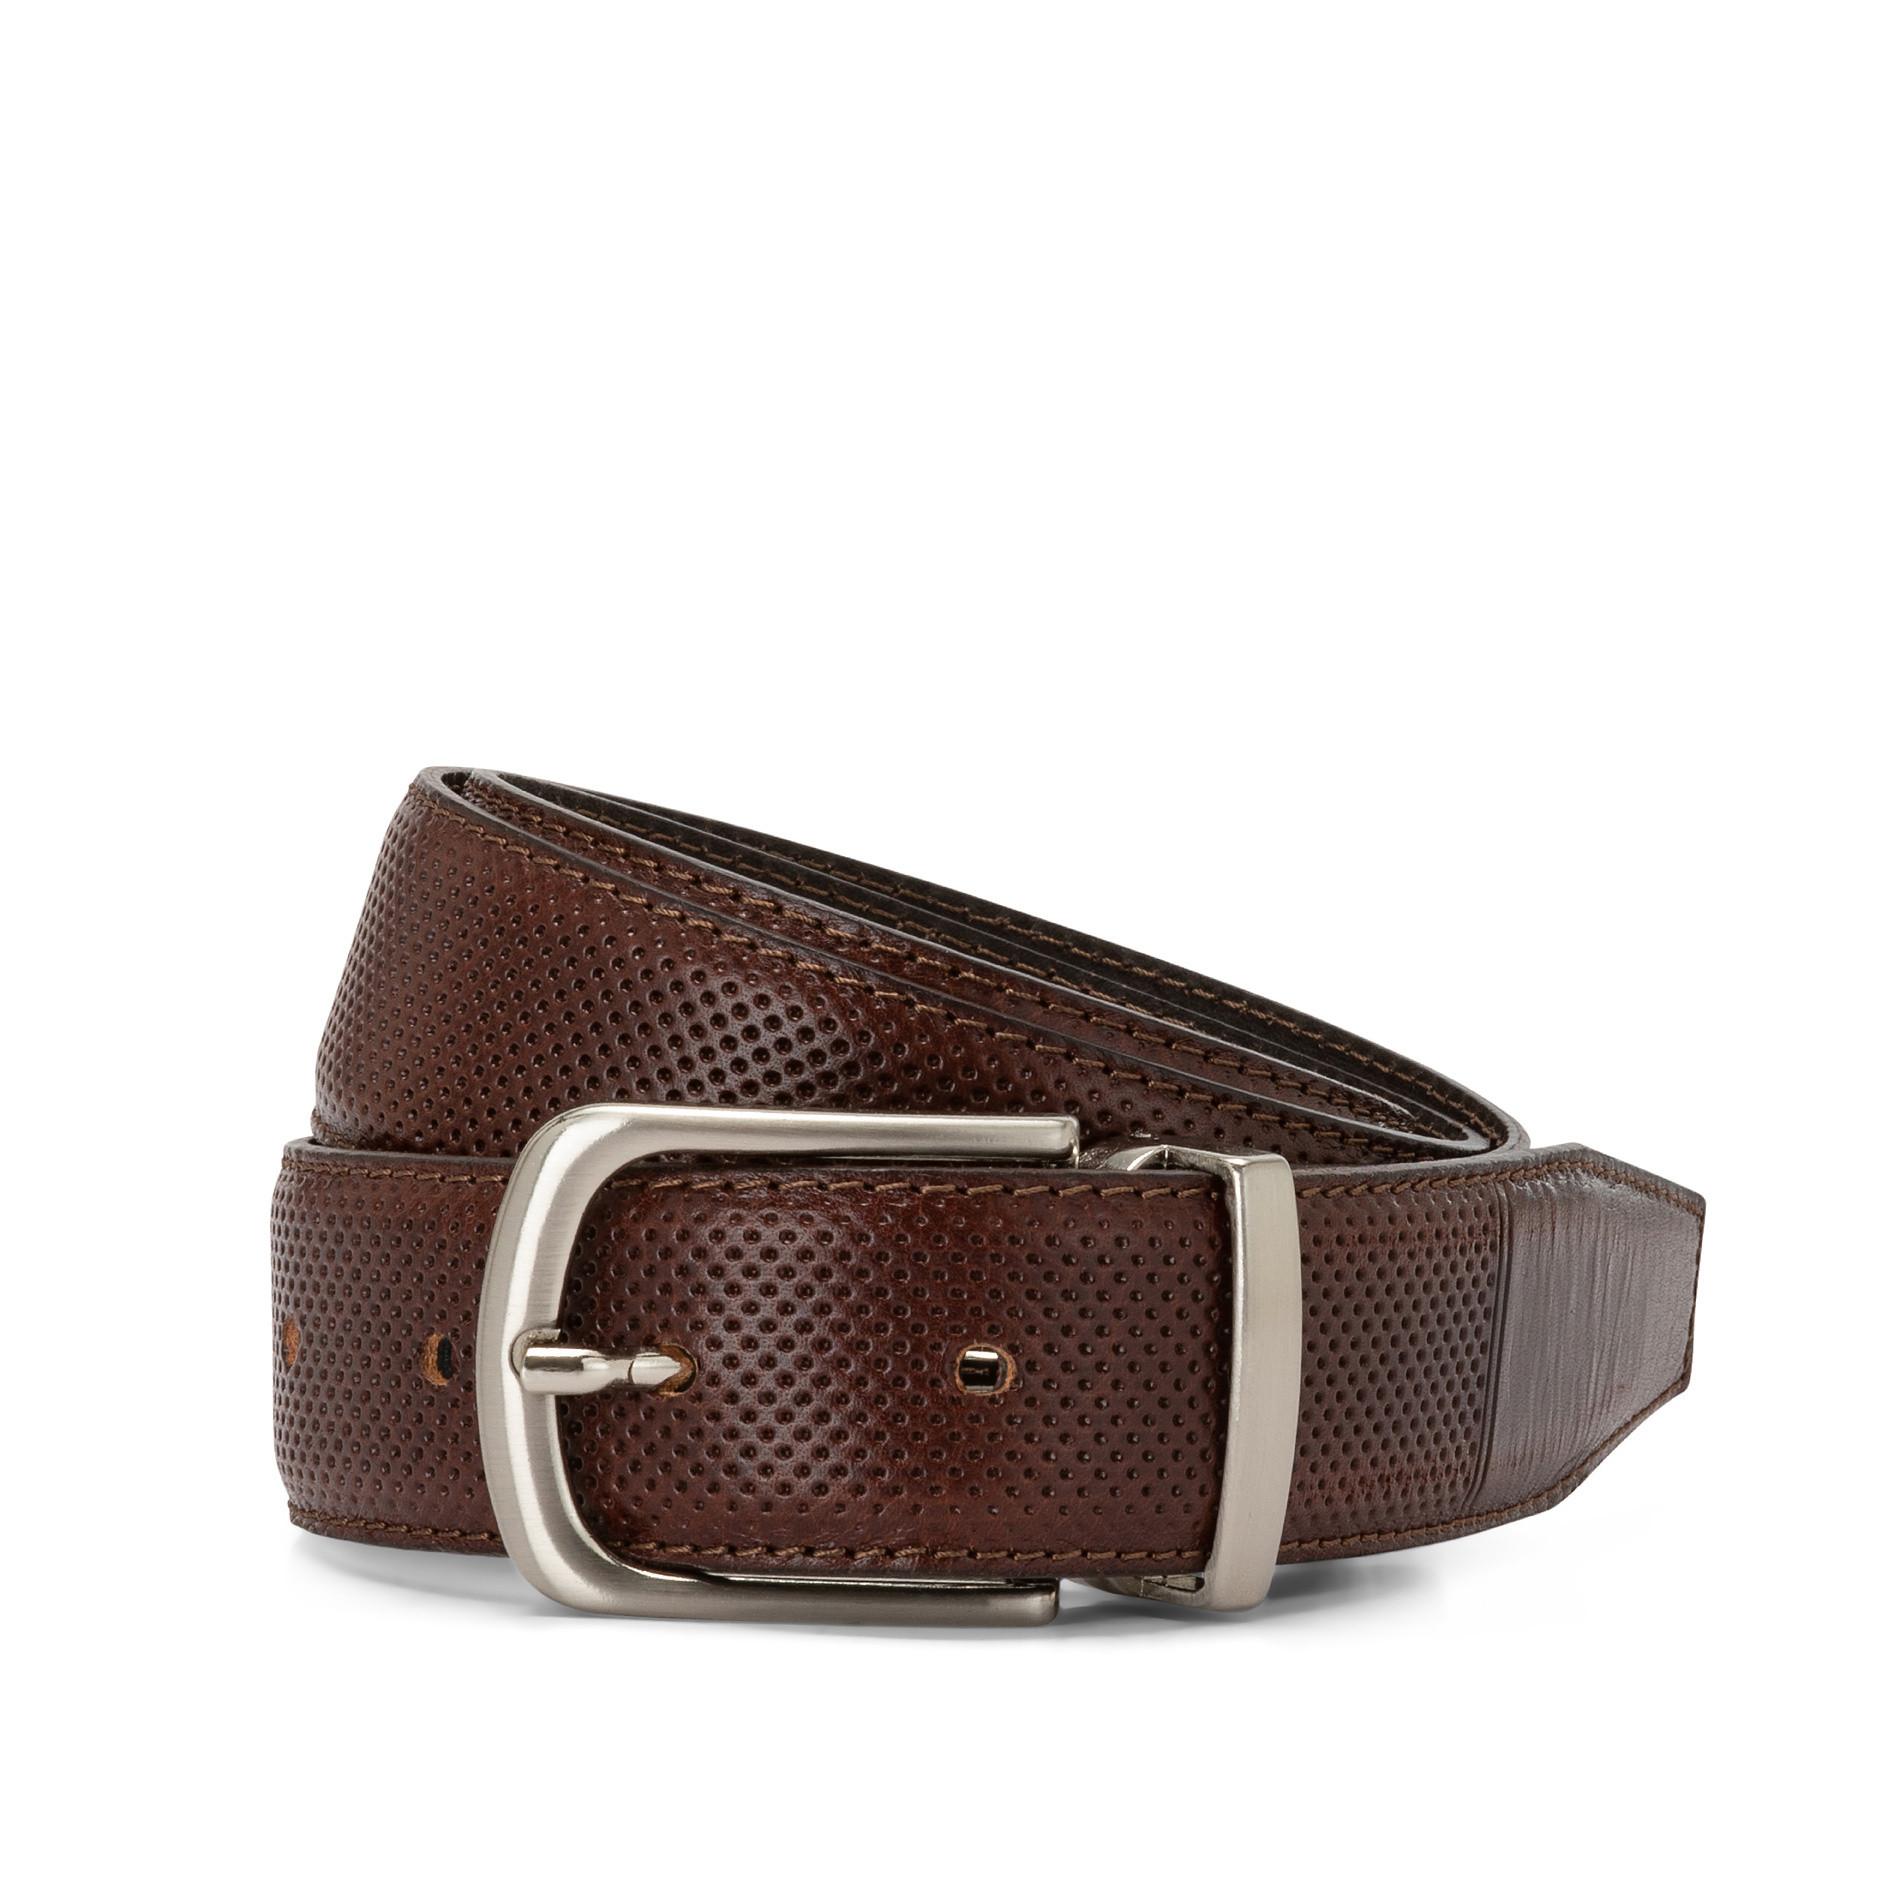 Cintura in vera pelle, Marrone scuro, large image number 1